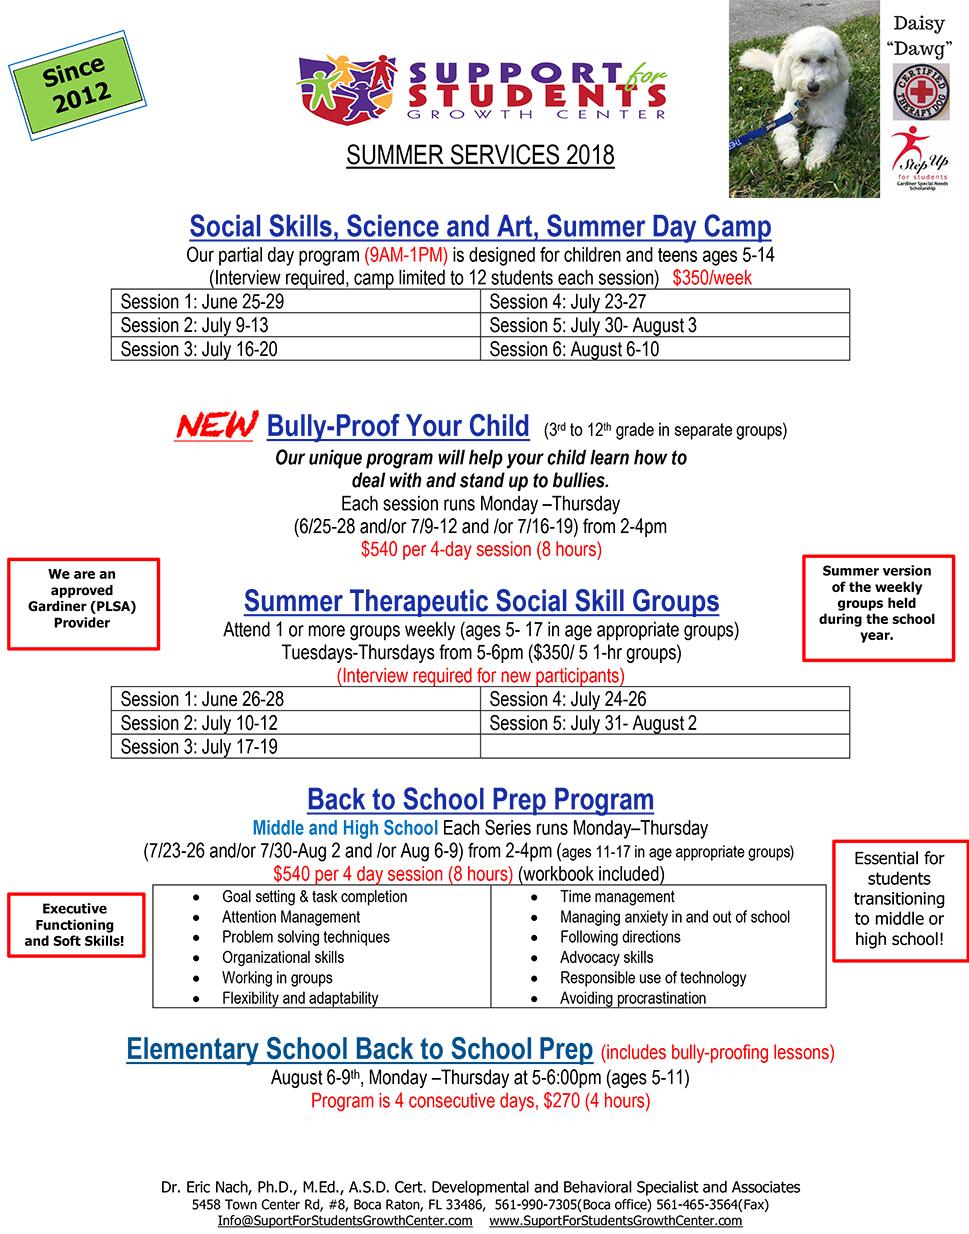 Summer Services 2018